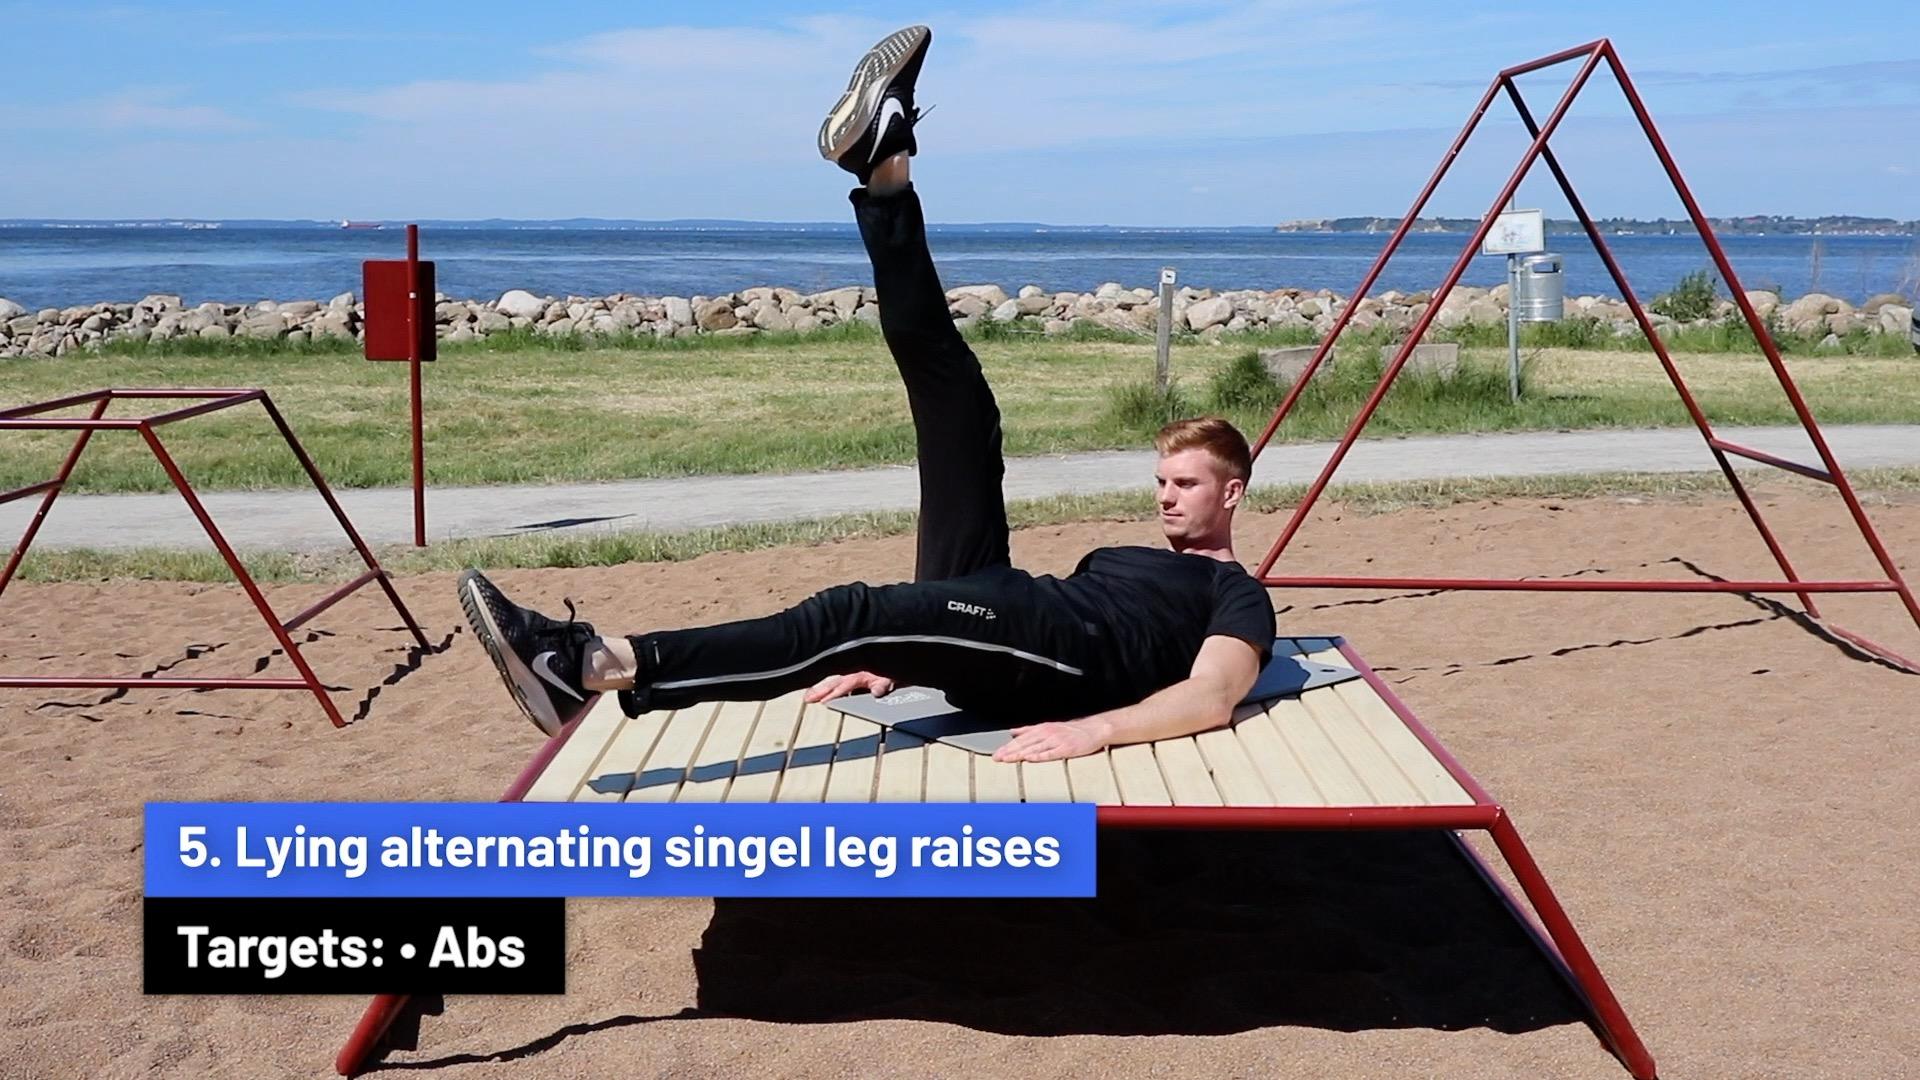 Lying alternating single leg raises